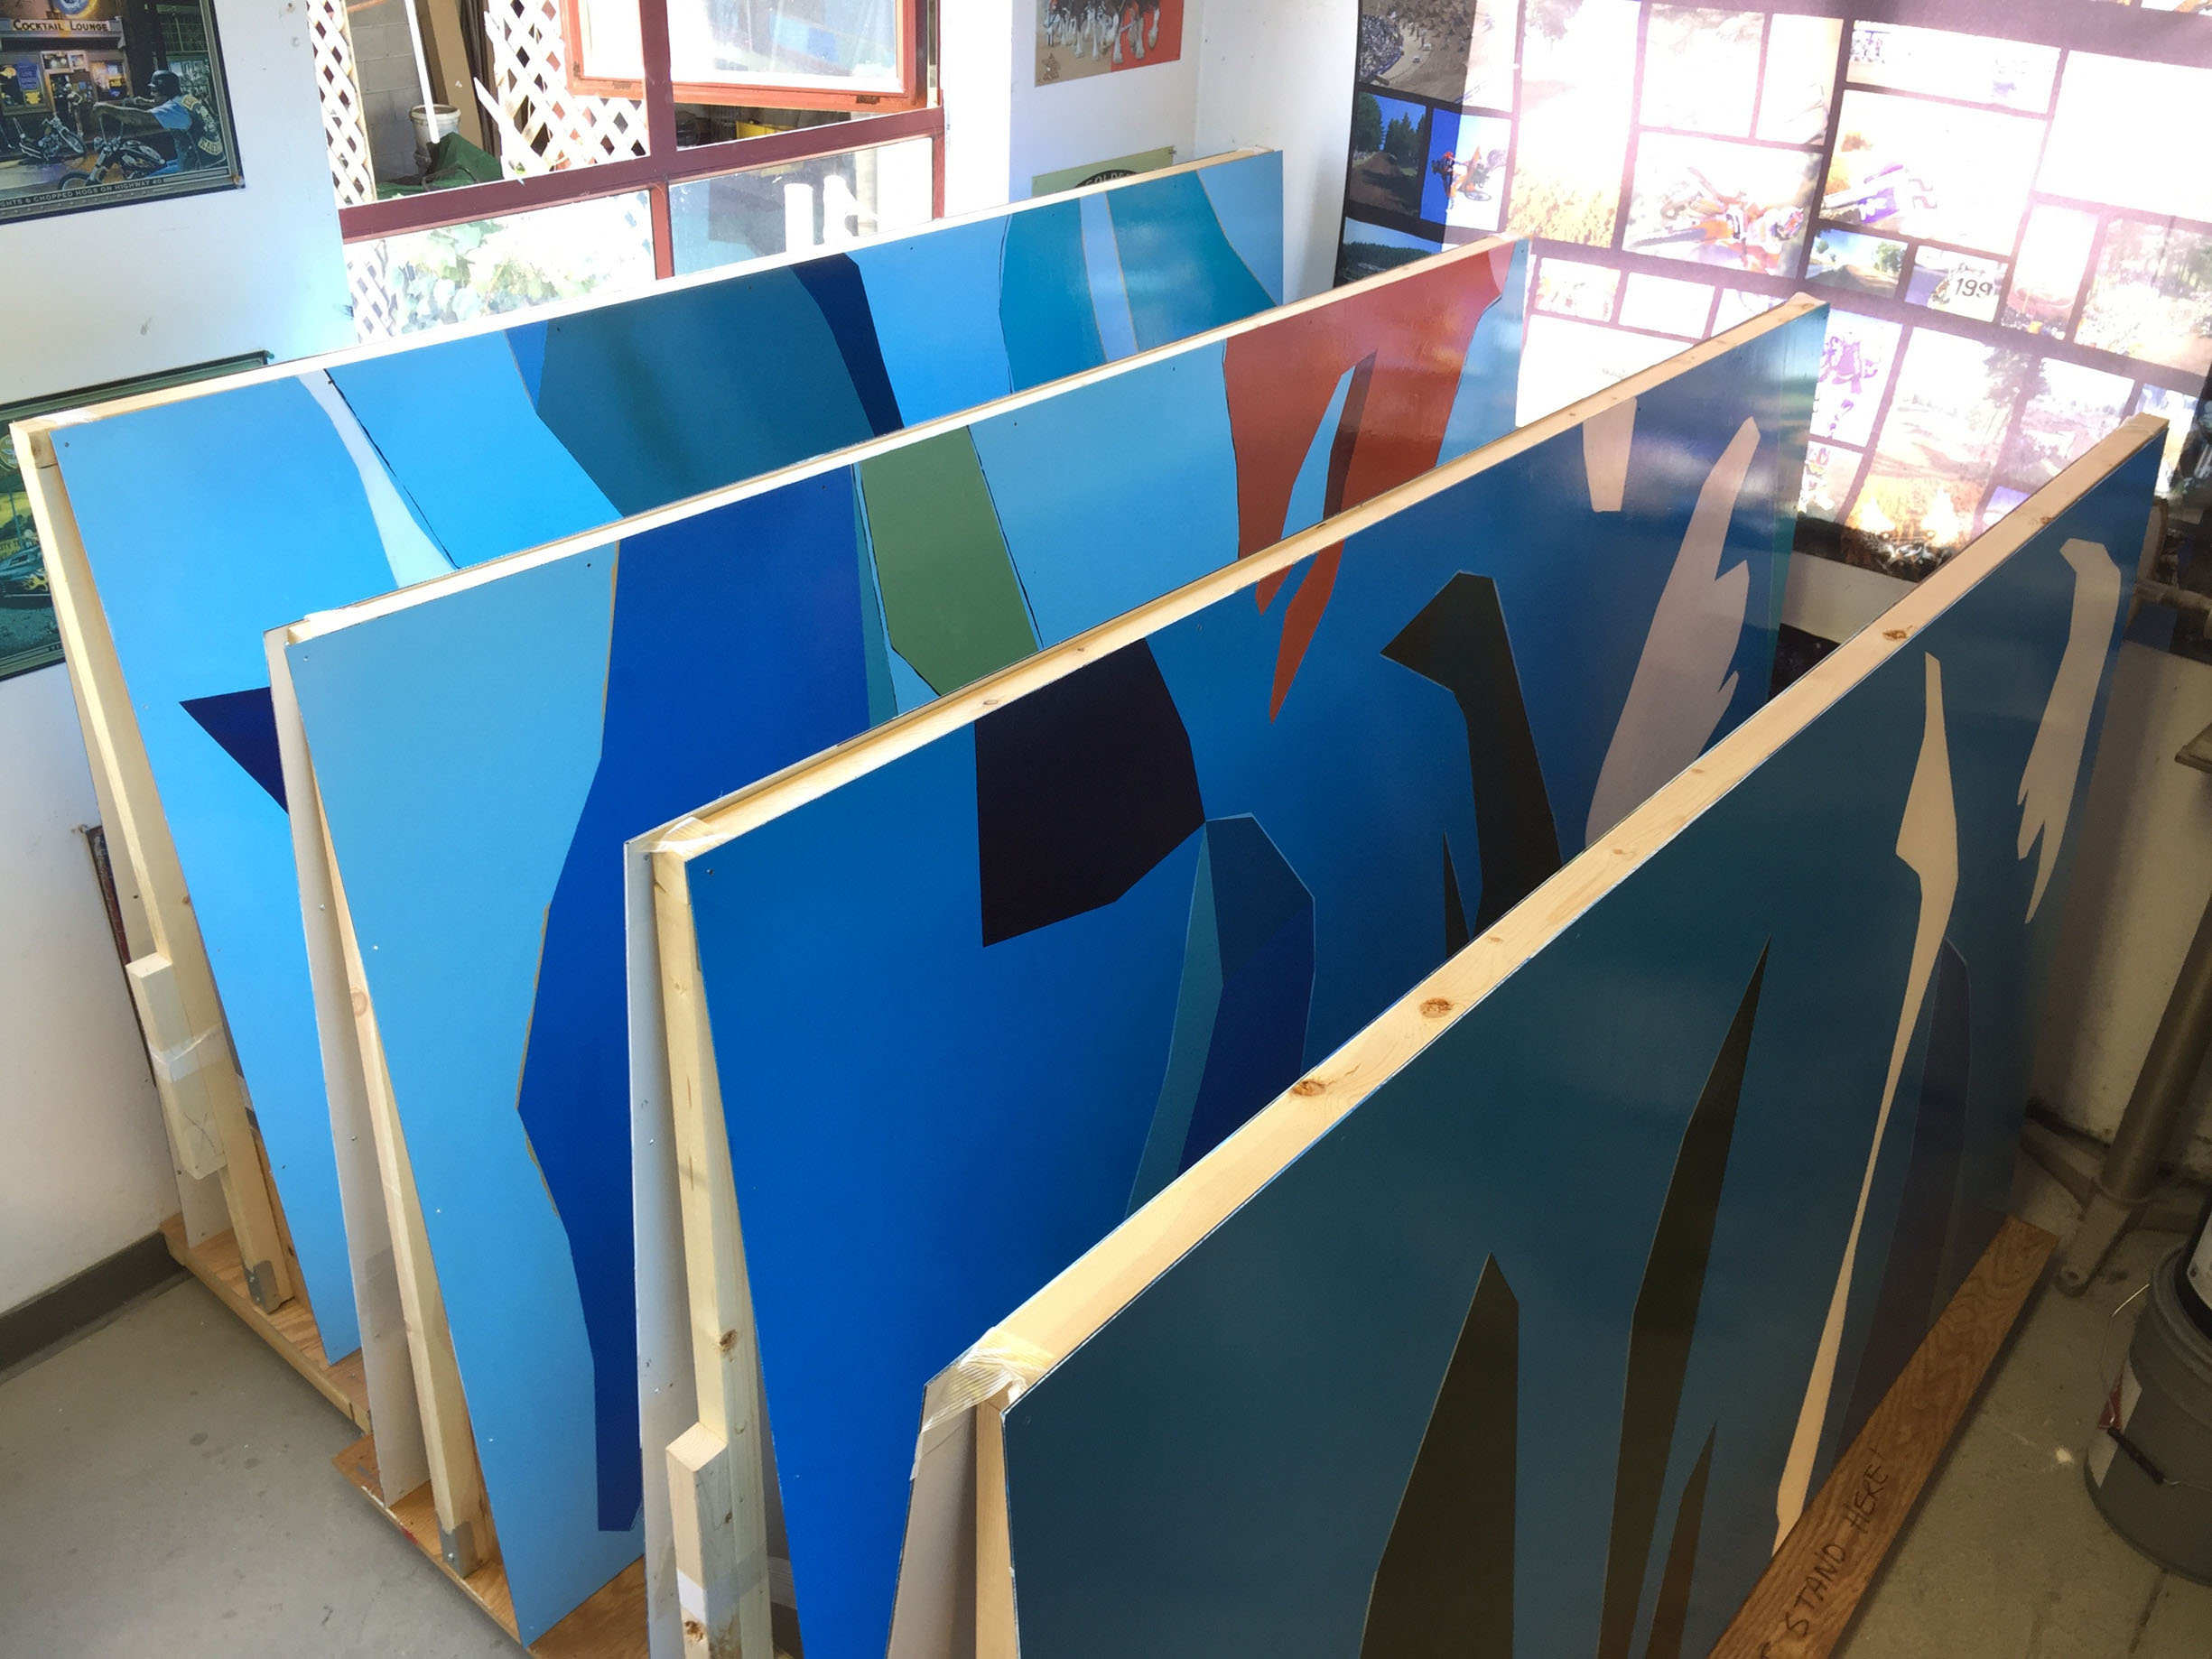 Mural panels resting between coats of varnish